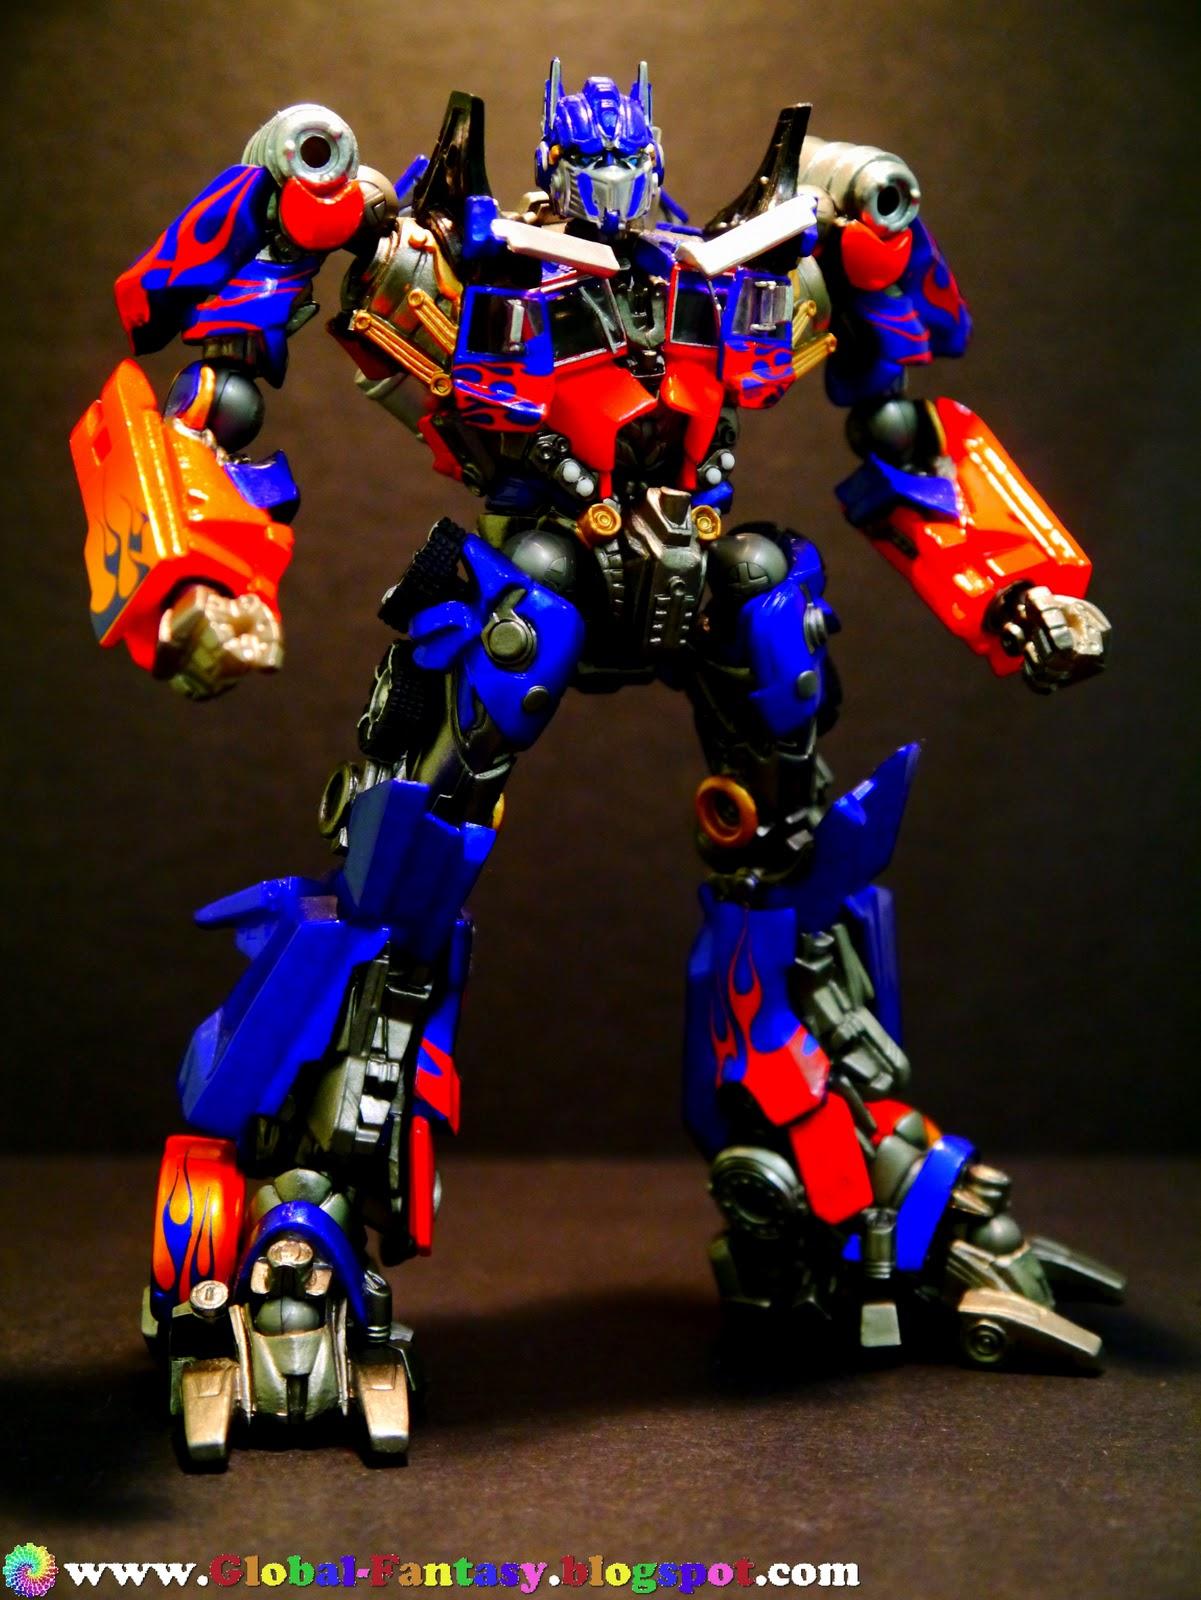 Sci Fi Transformer : Kaiyodo sci fi revoltech series no transformers